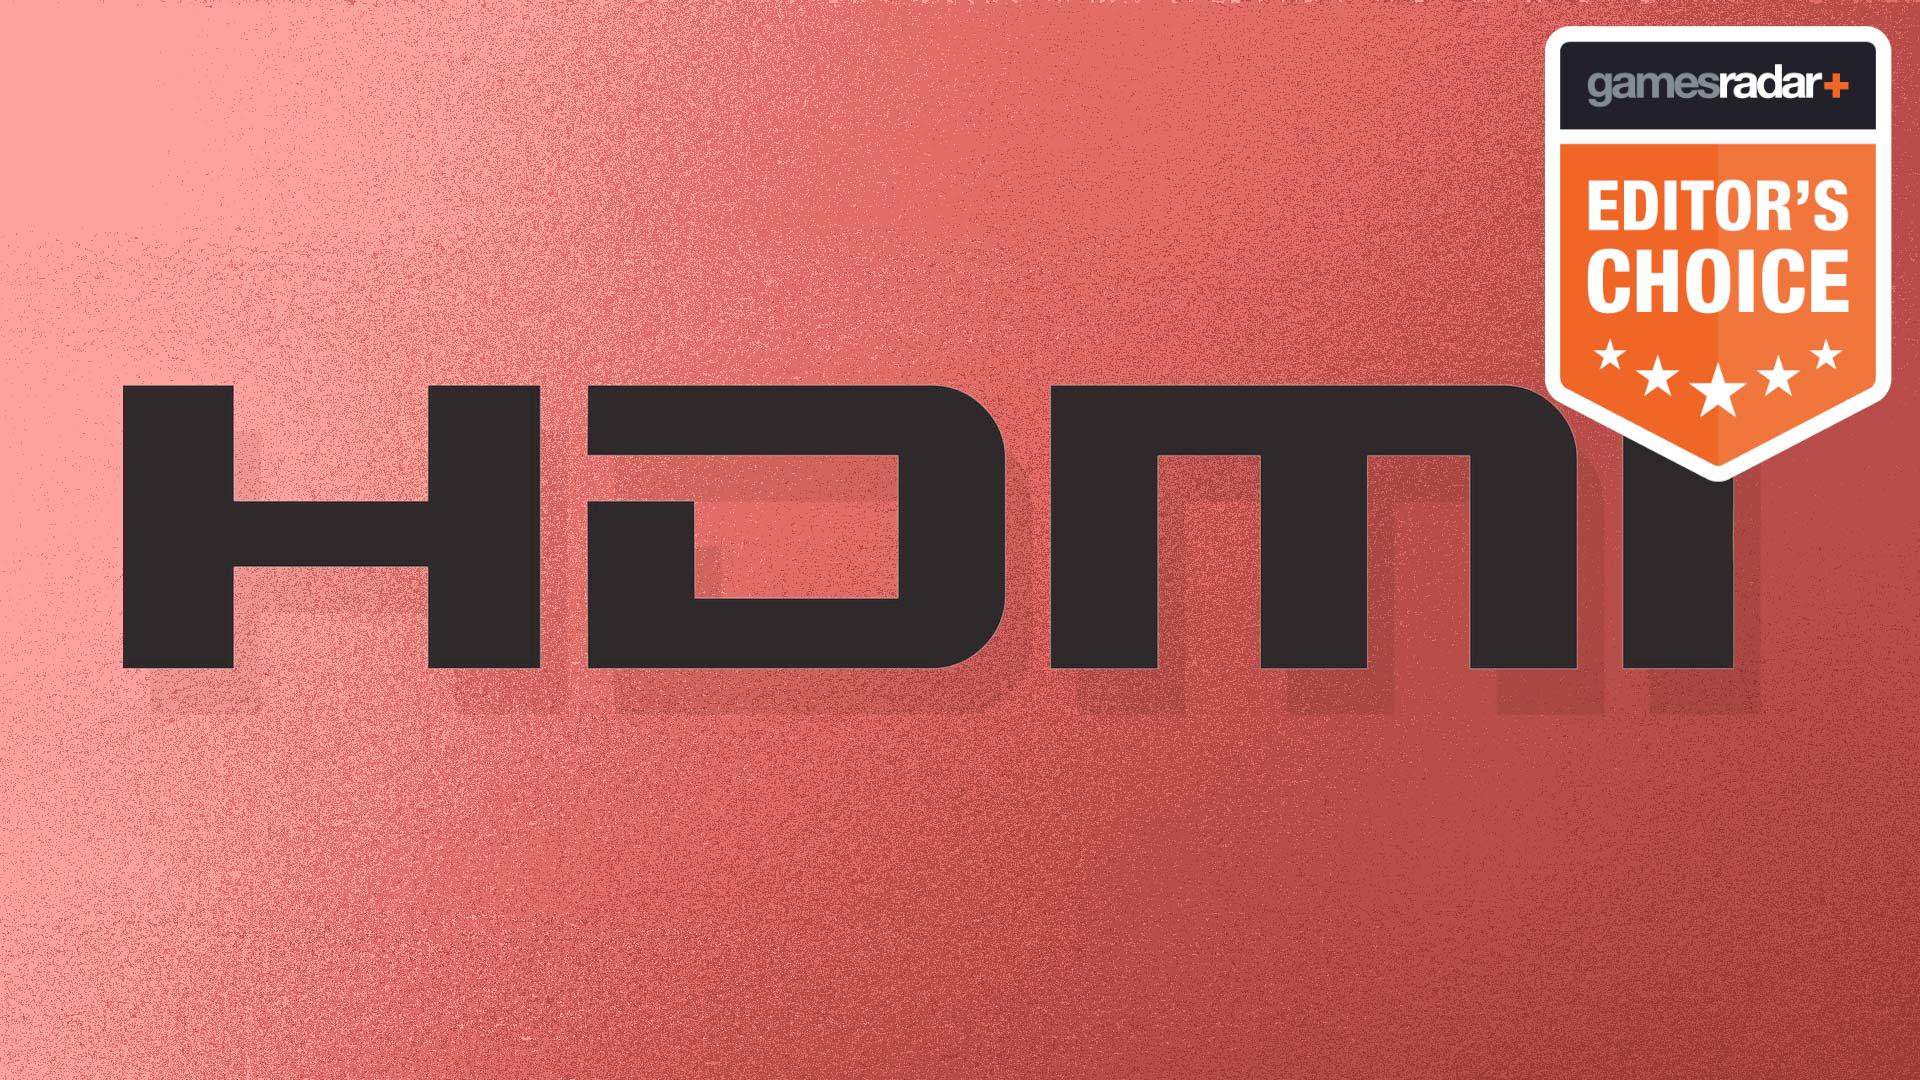 Emebay 4K-HDMI-Kabel HDTV LCD-TV und Plasma 3 Meter Recorder//Player HD-DVD Projektoren PS3//PS4 vergoldet Blu-Ray andere Decoder Sky HD Box HDMI 2.0 f/ür Xbox Video-Monitor